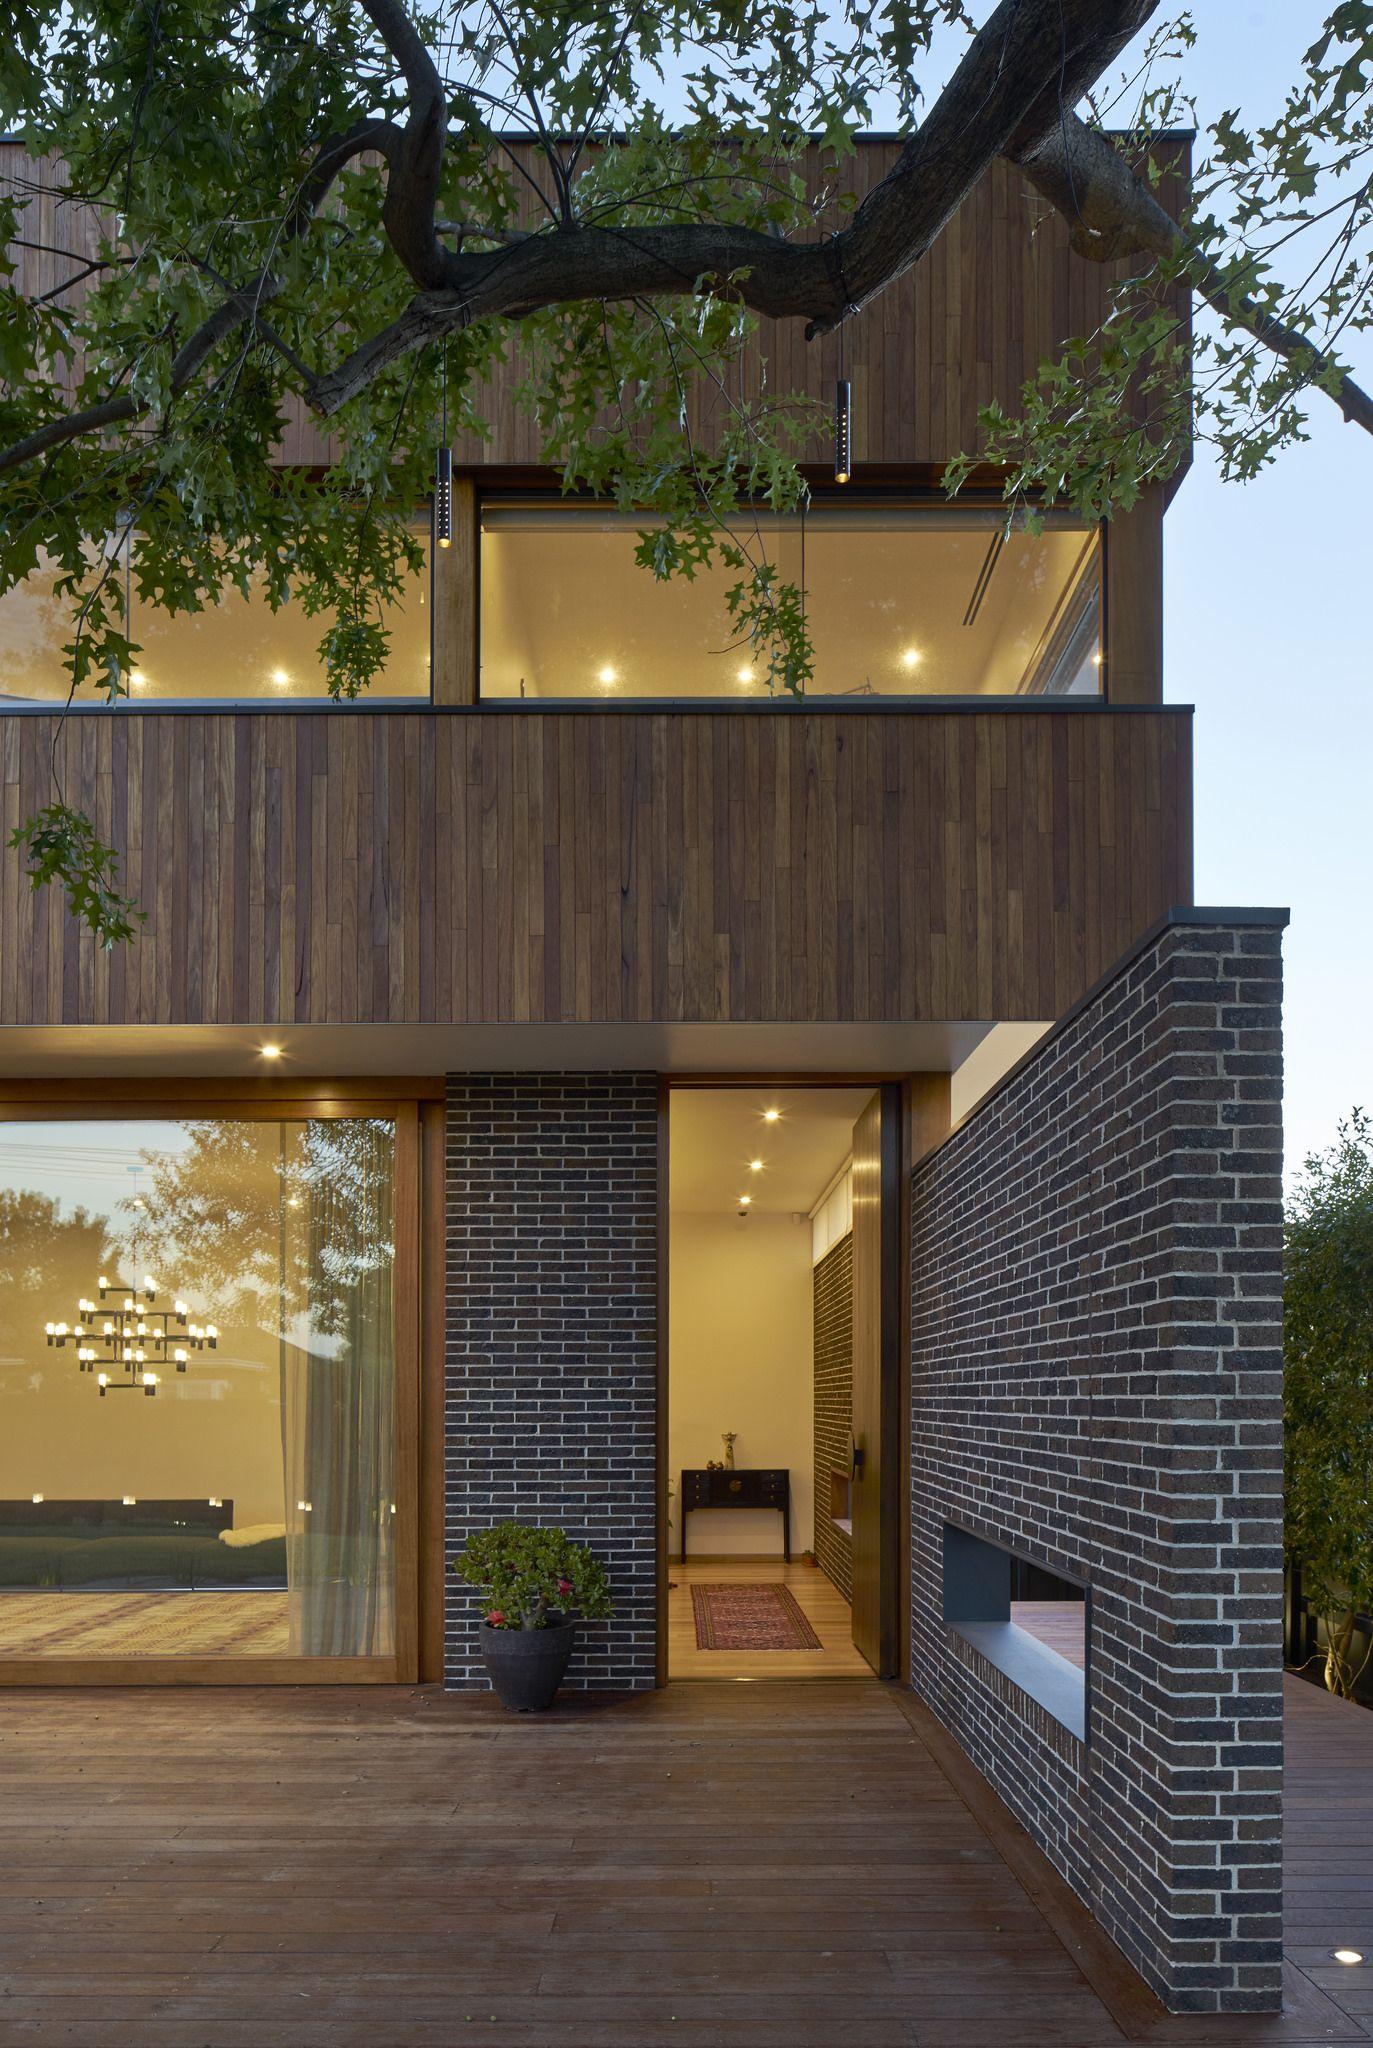 Hawthorn50 London London Brick Architecture Architecture